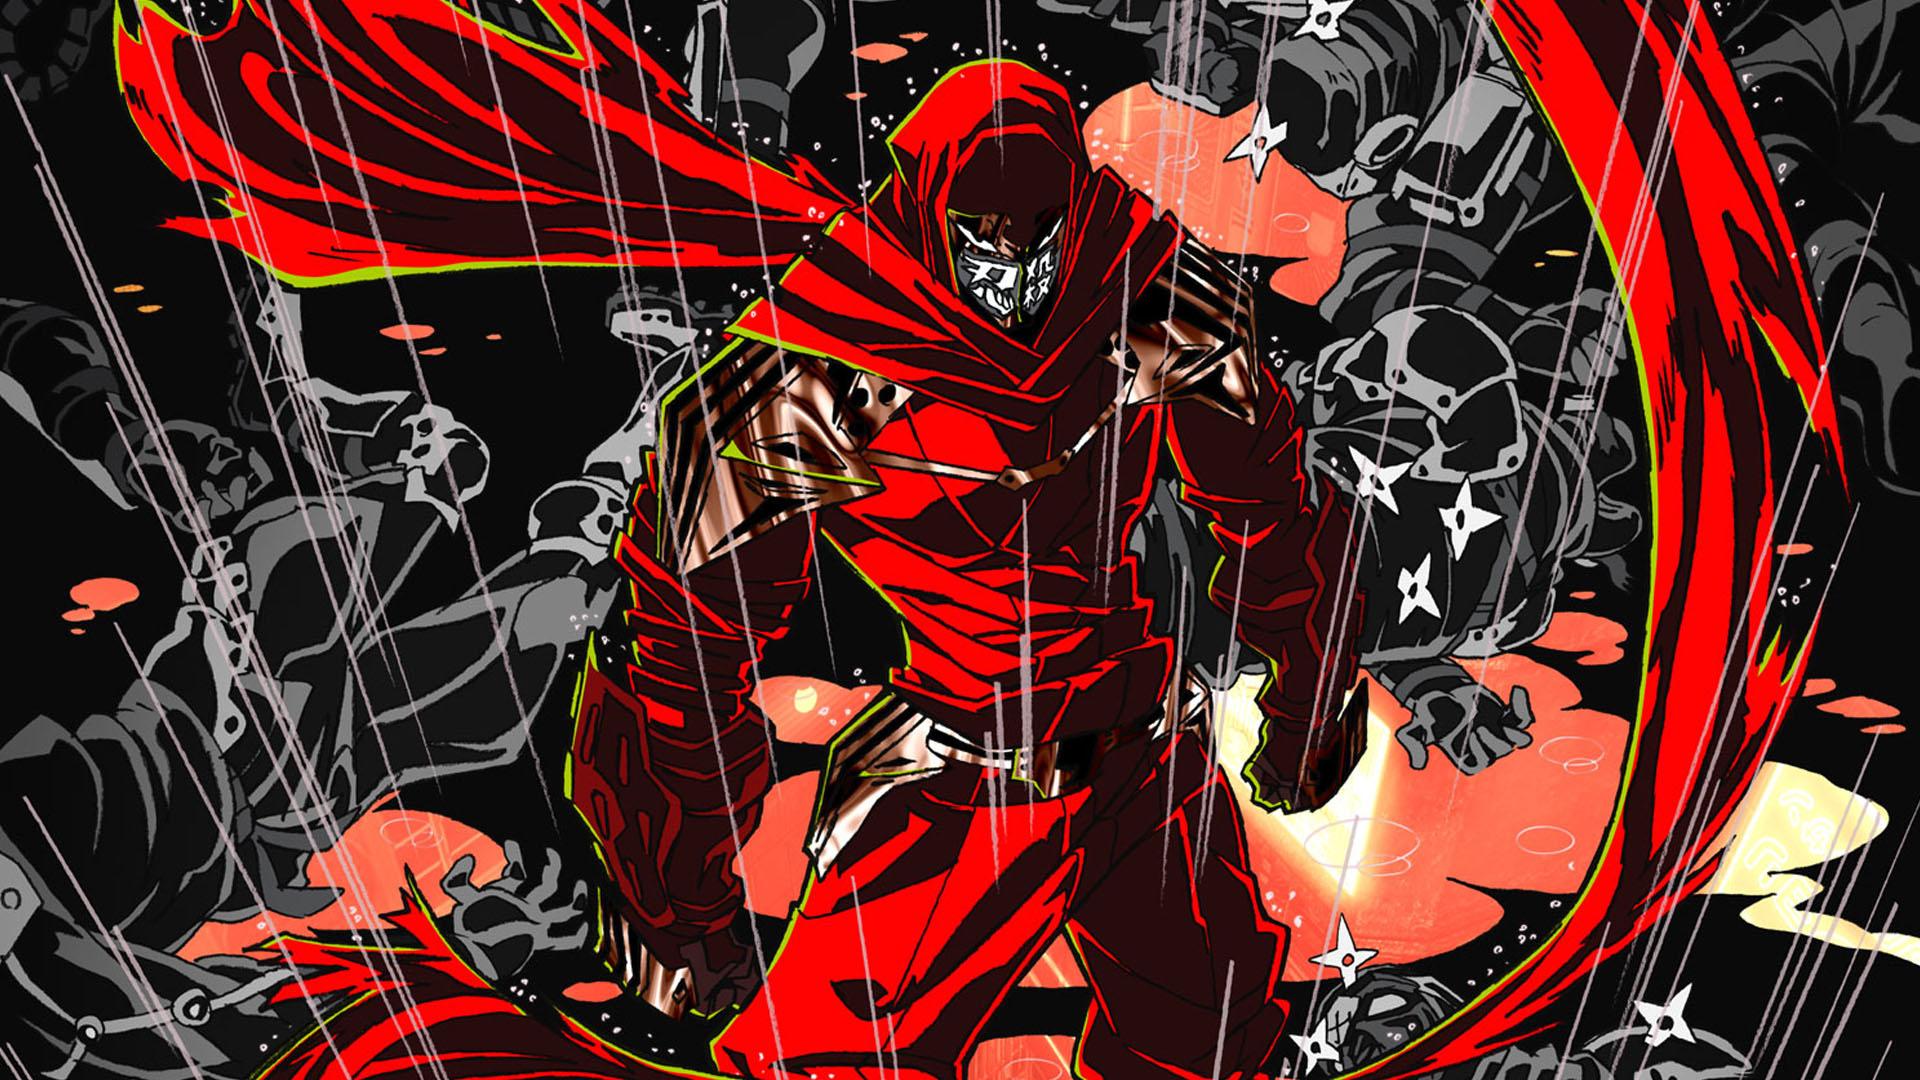 Ninja Slayer From Animation